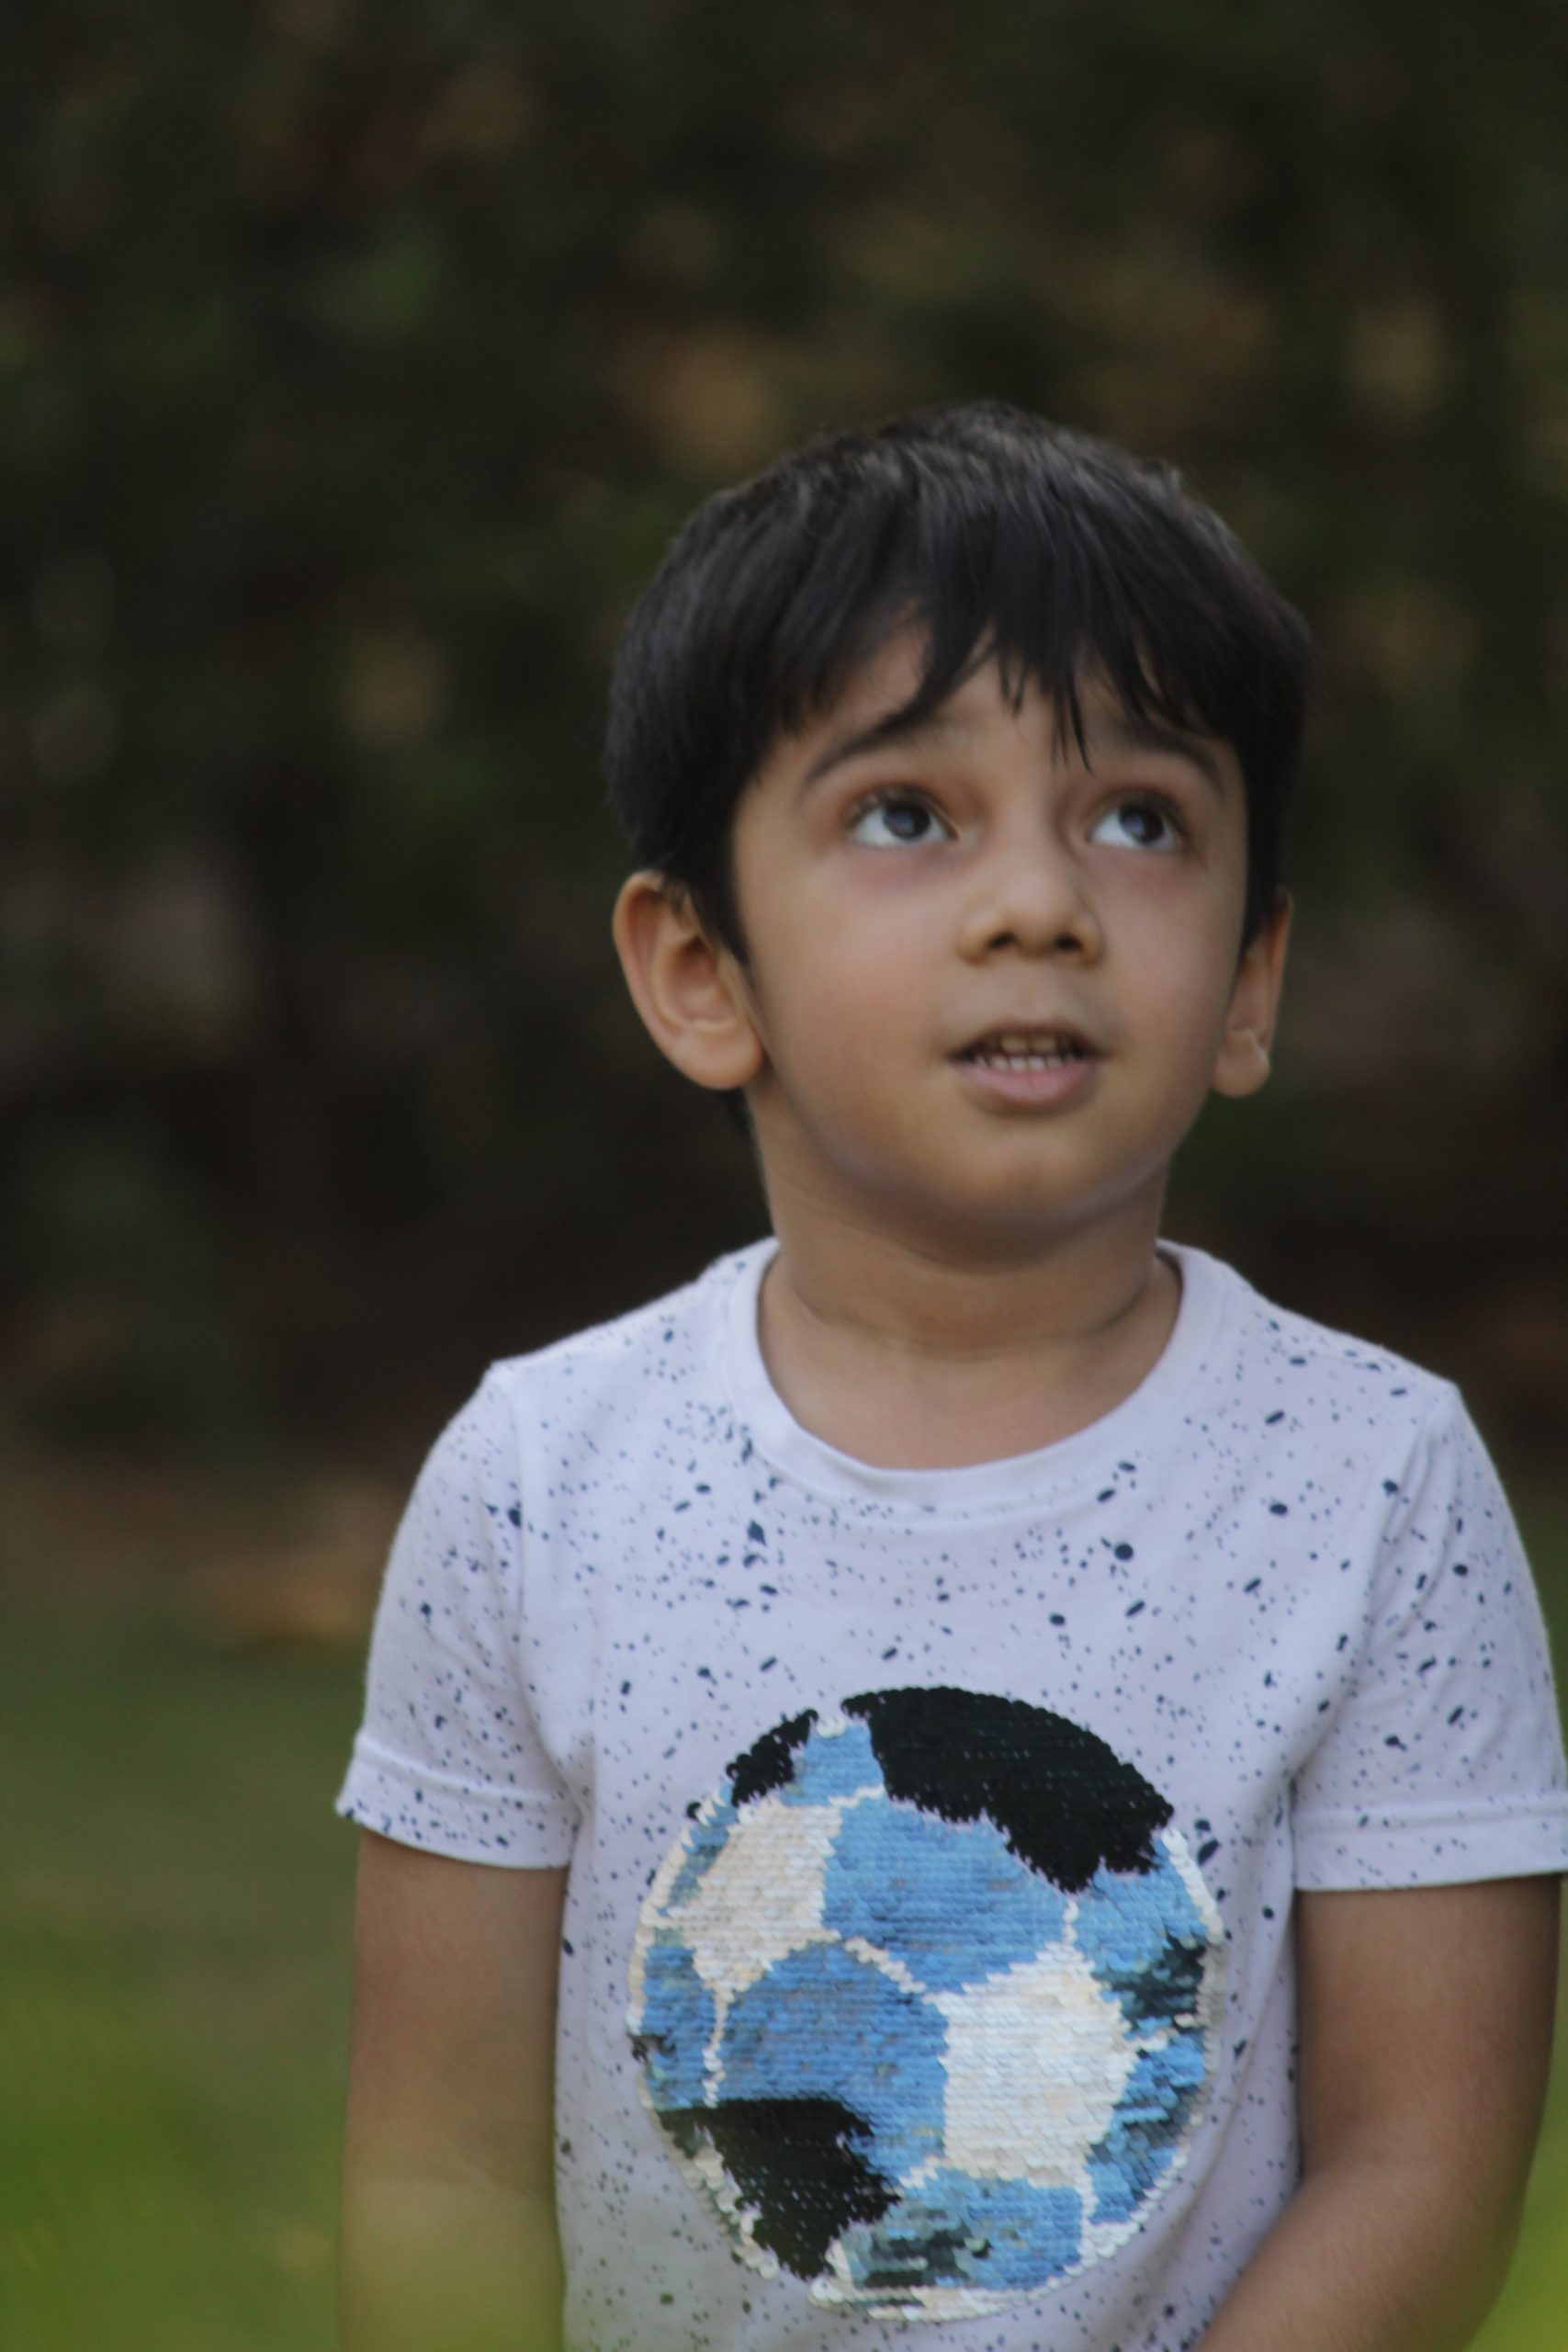 kid looking at the upward direction